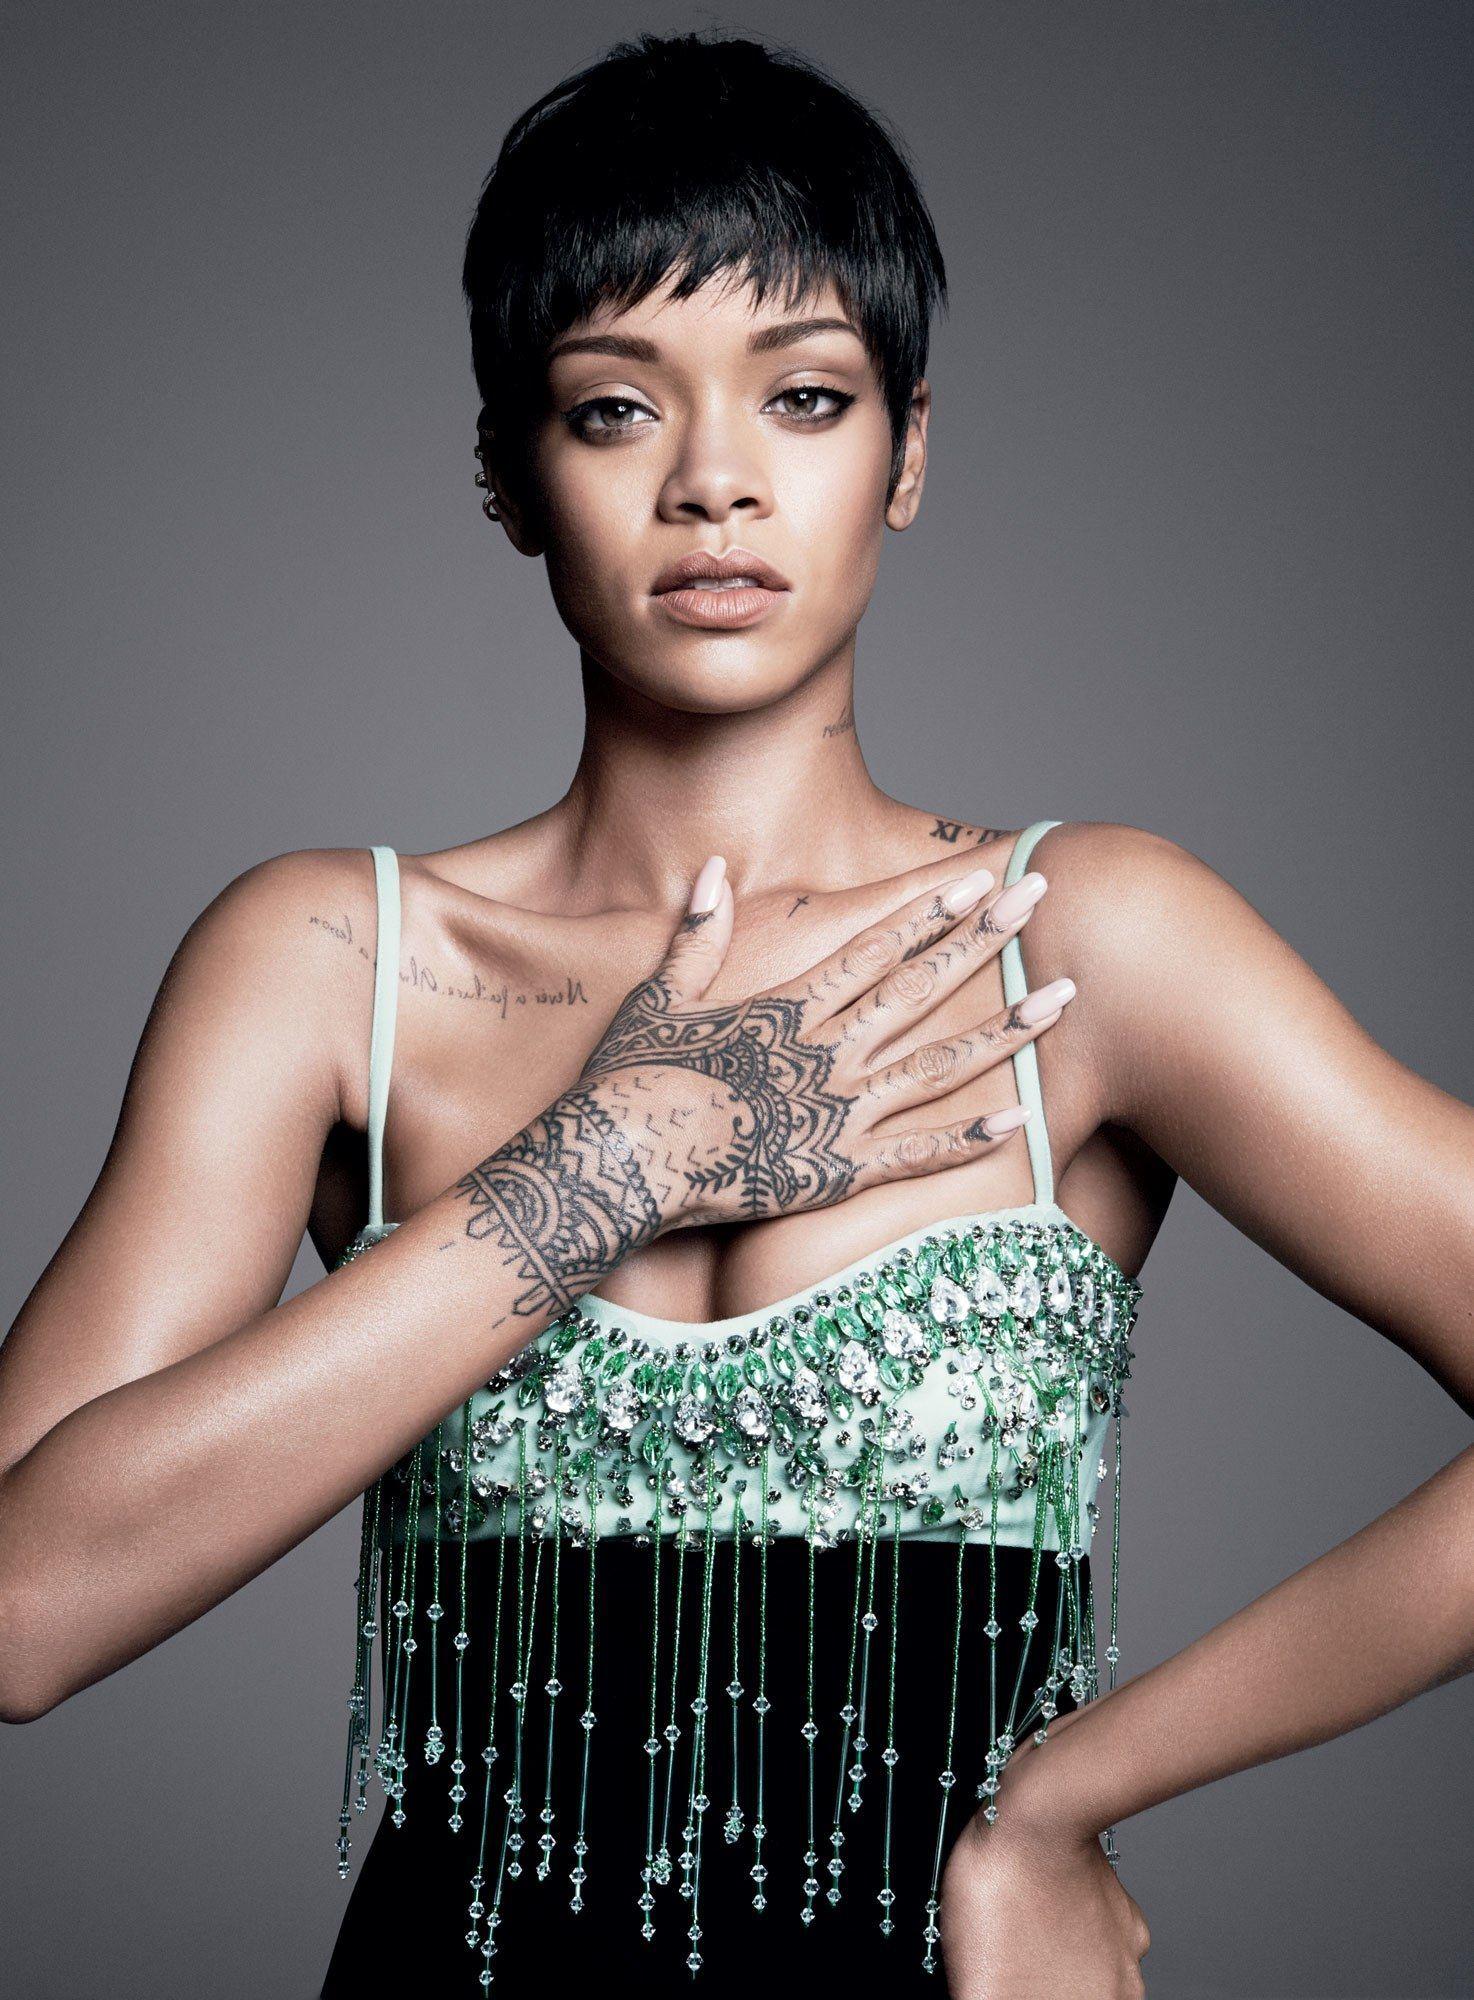 Megan Fox sampai Rihanna, Ini Artis dengan Tato Terseksi